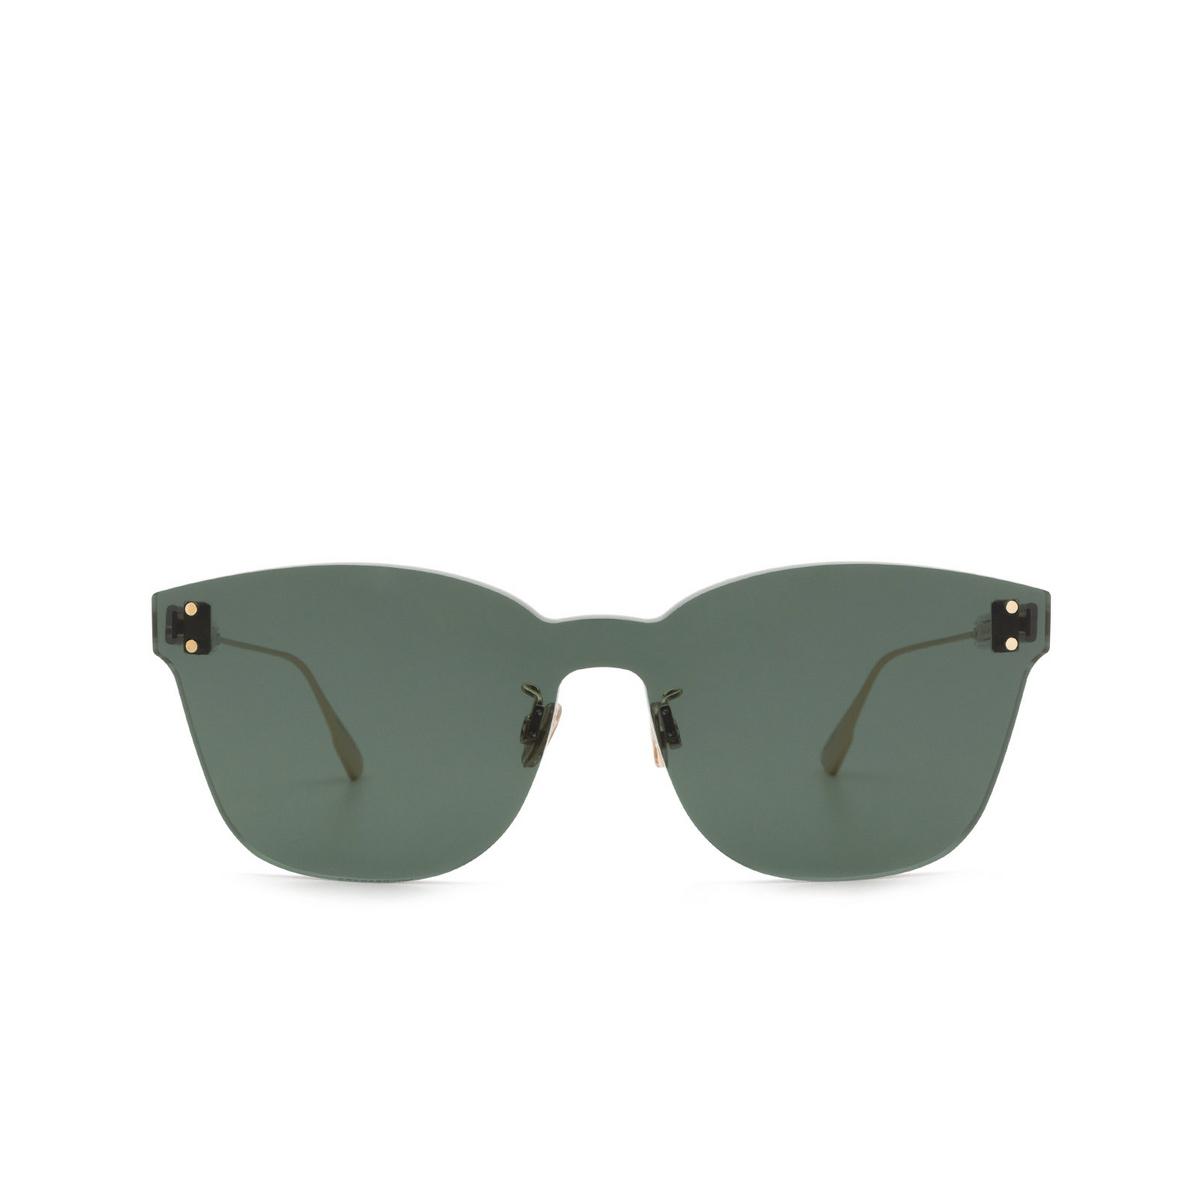 Dior® Mask Sunglasses: DIORCOLORQUAKE2 color Green 1ED/QT - front view.